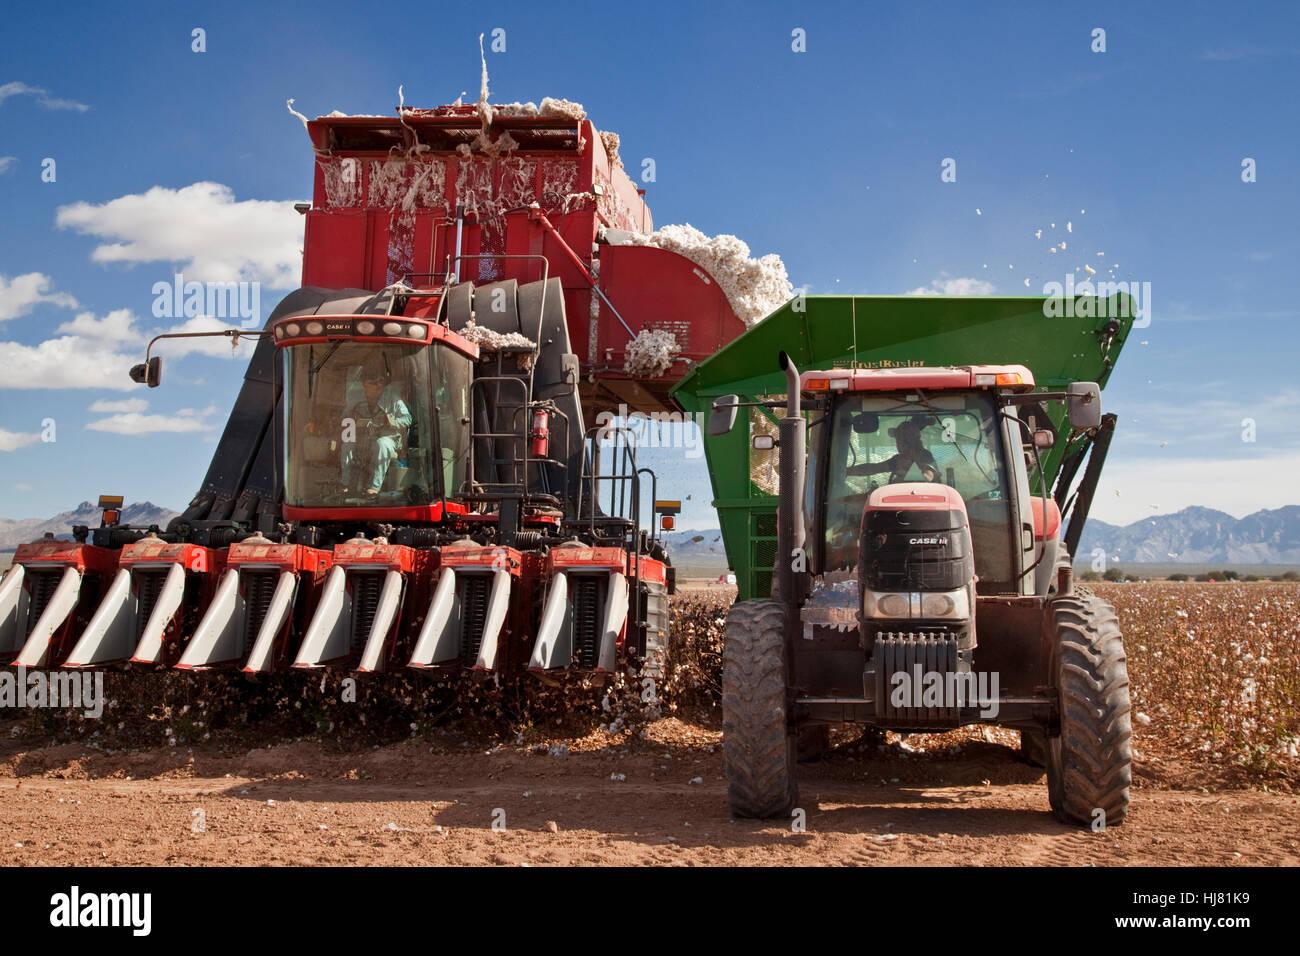 Cosechadora de algodón cosecha- la agricultura - Marana, Arizona Imagen De Stock